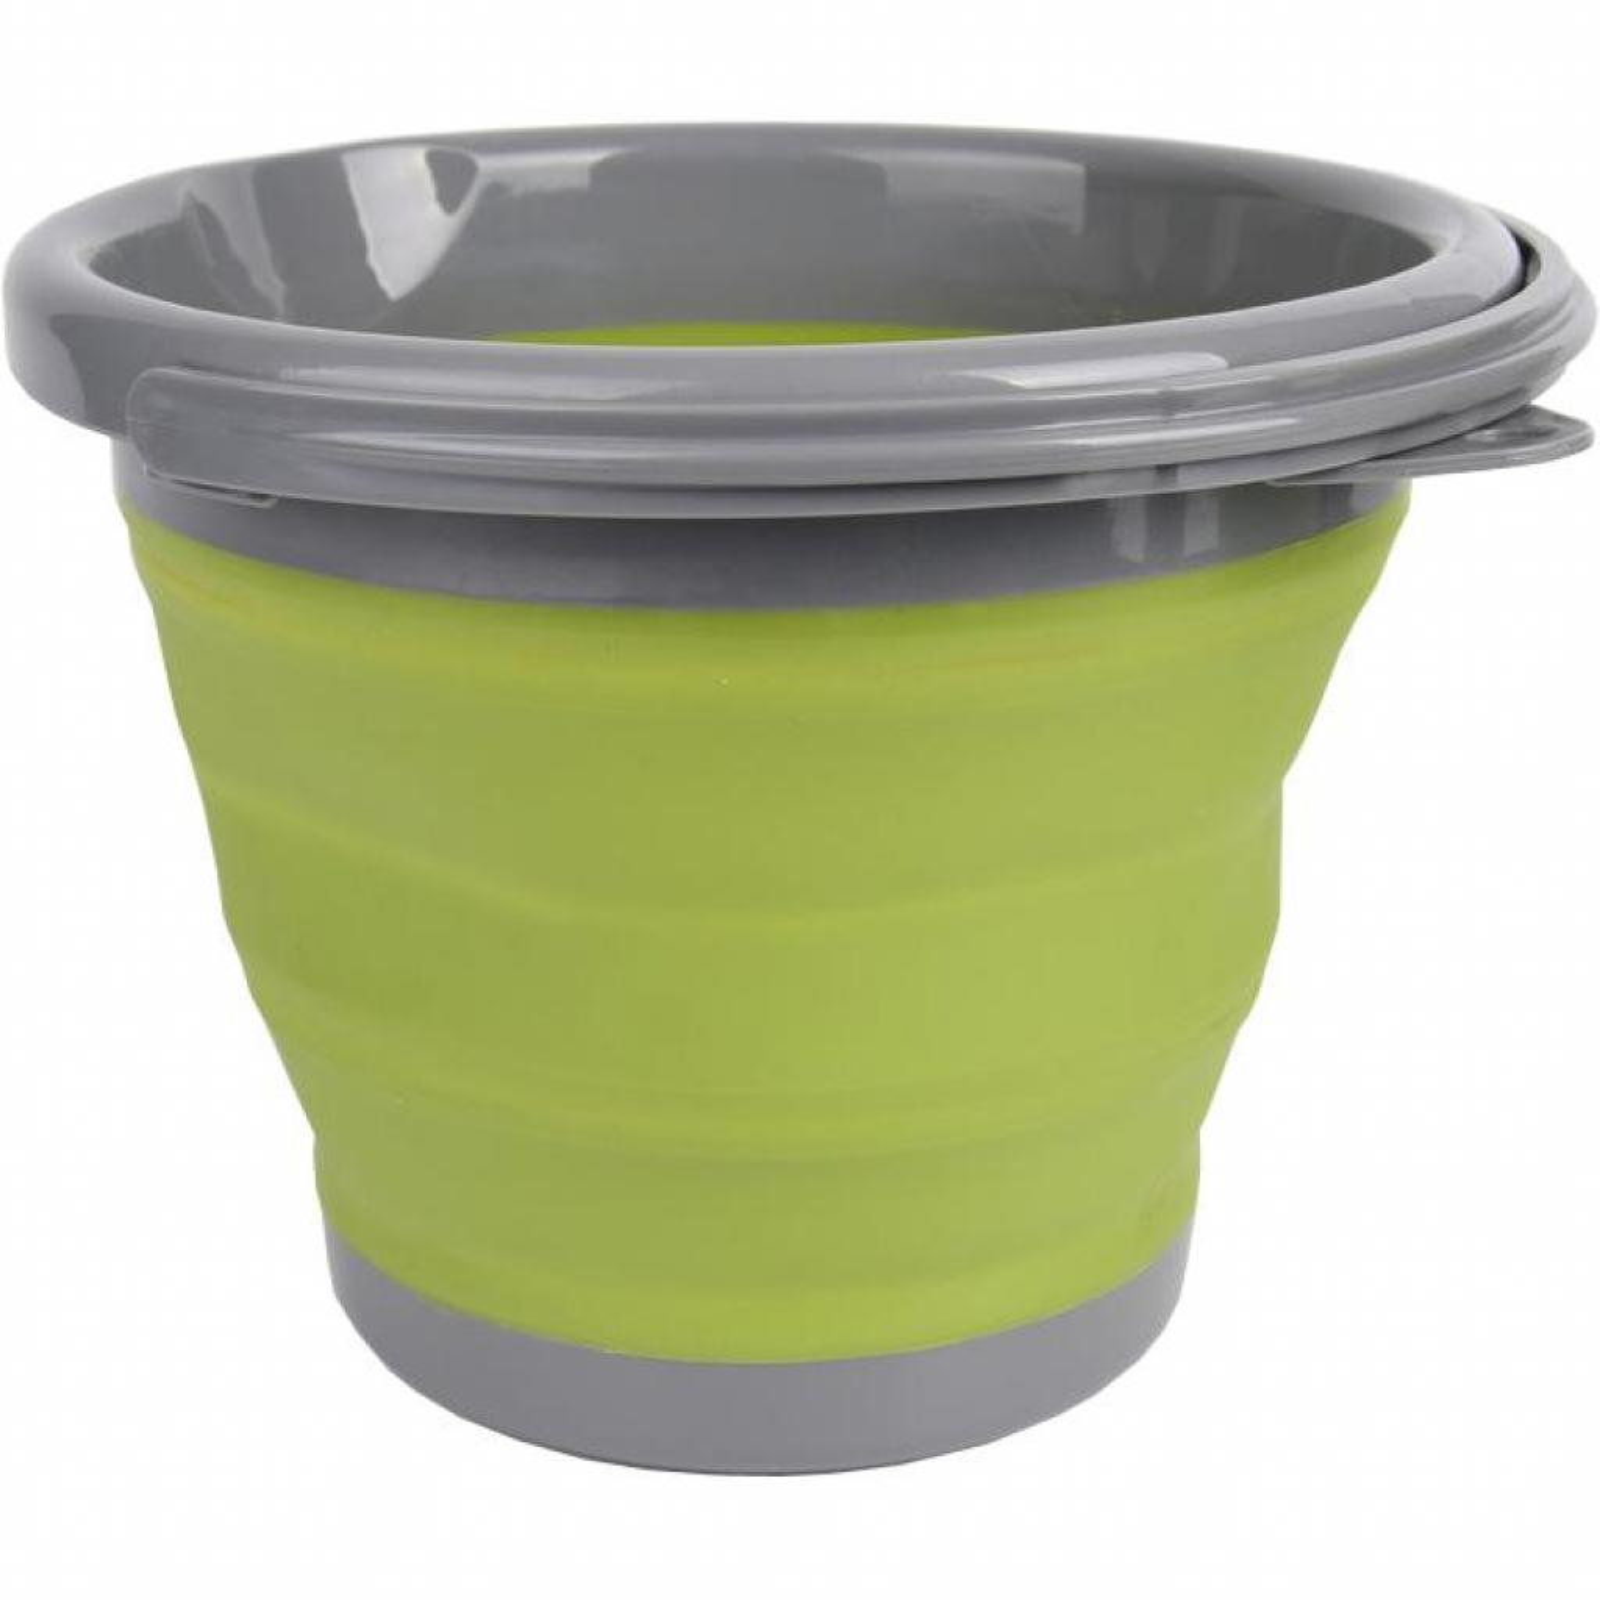 Ведро складное Tramp 10L olive (TRC-091-olive)